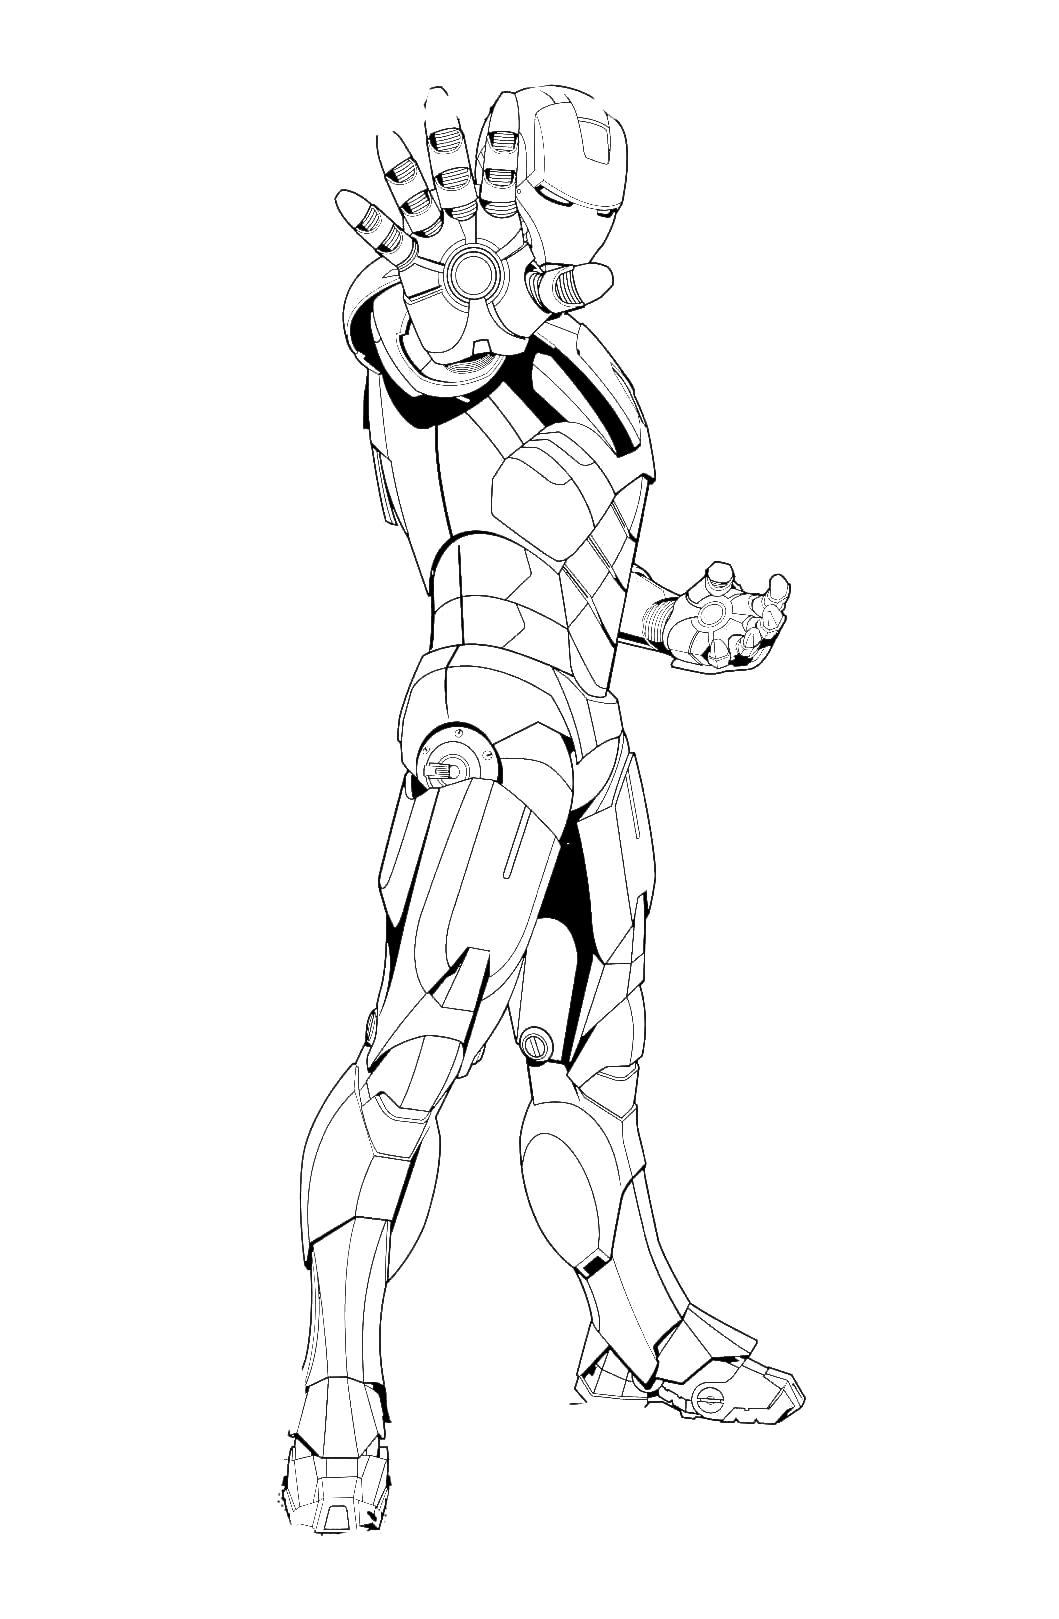 Iron Man Iron Man Sta Caricando La Sua Arma